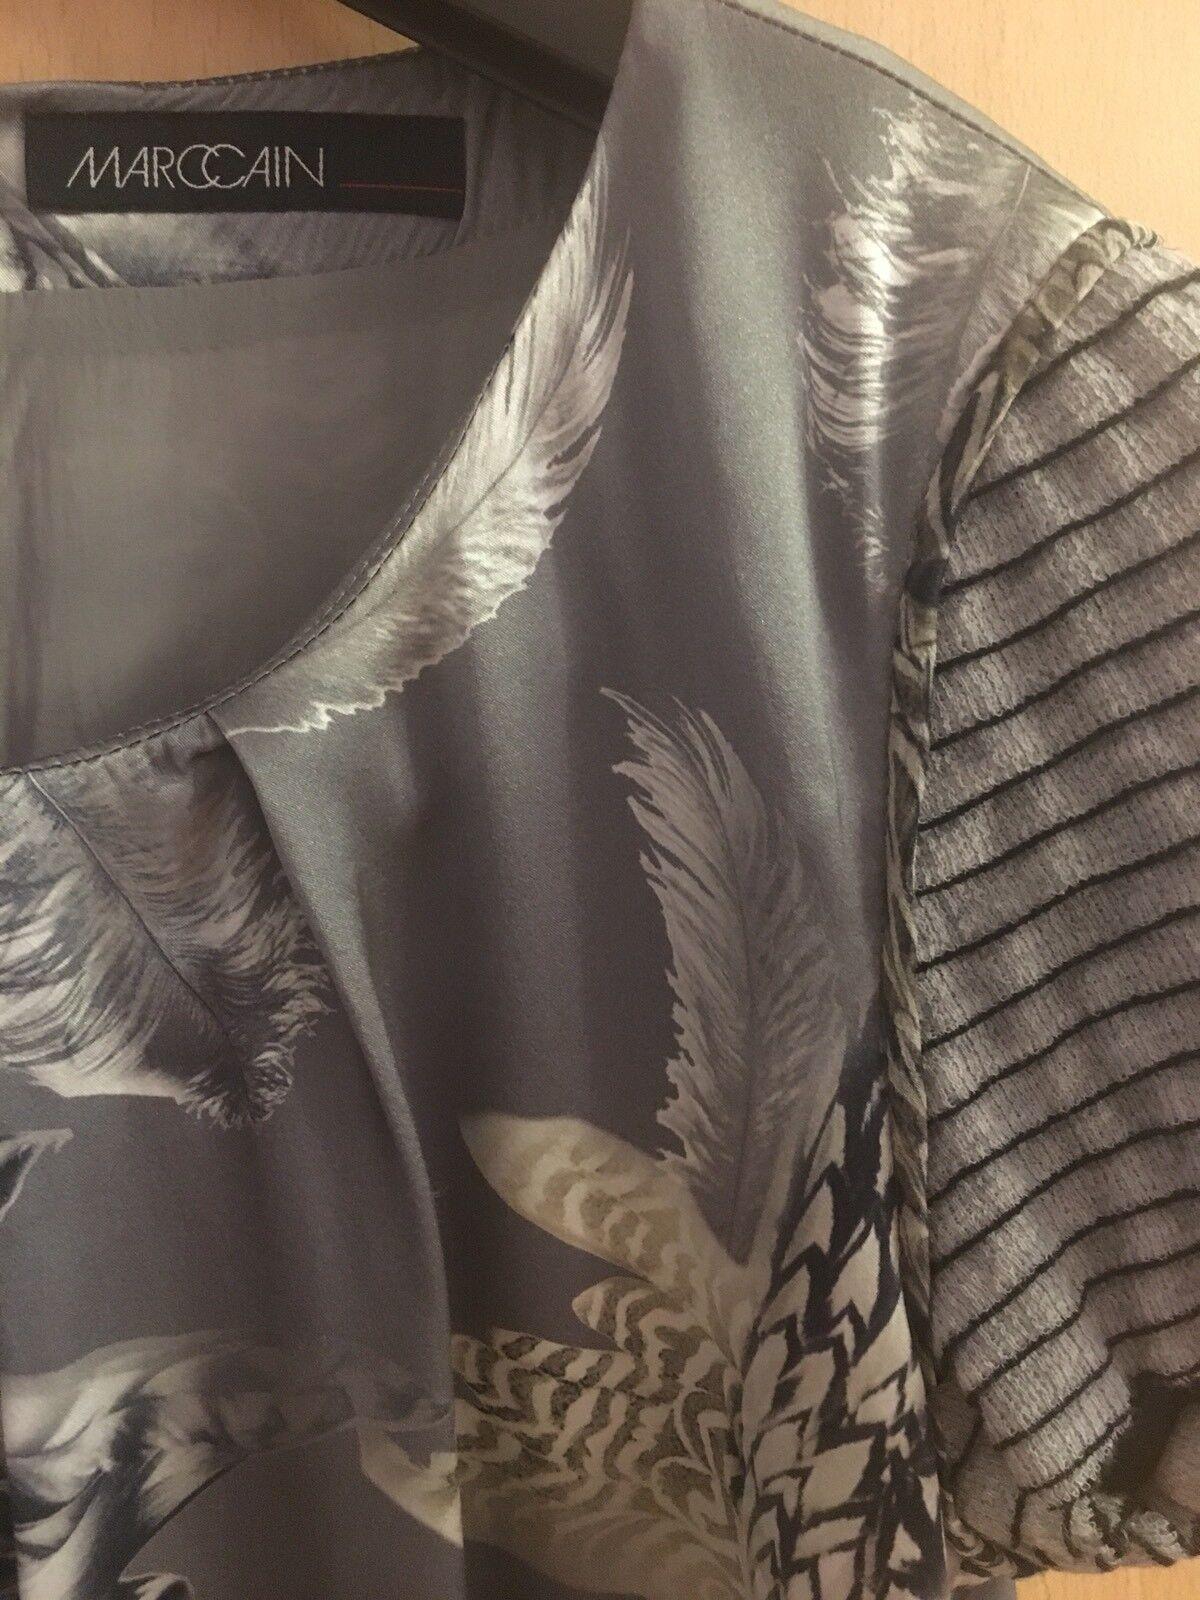 953edfb2e5ea4 ... Kleid MARC CAIN Etuikleid Seide Gr. N3 = = = 38 Grau marccain dress  e61cb9 ...